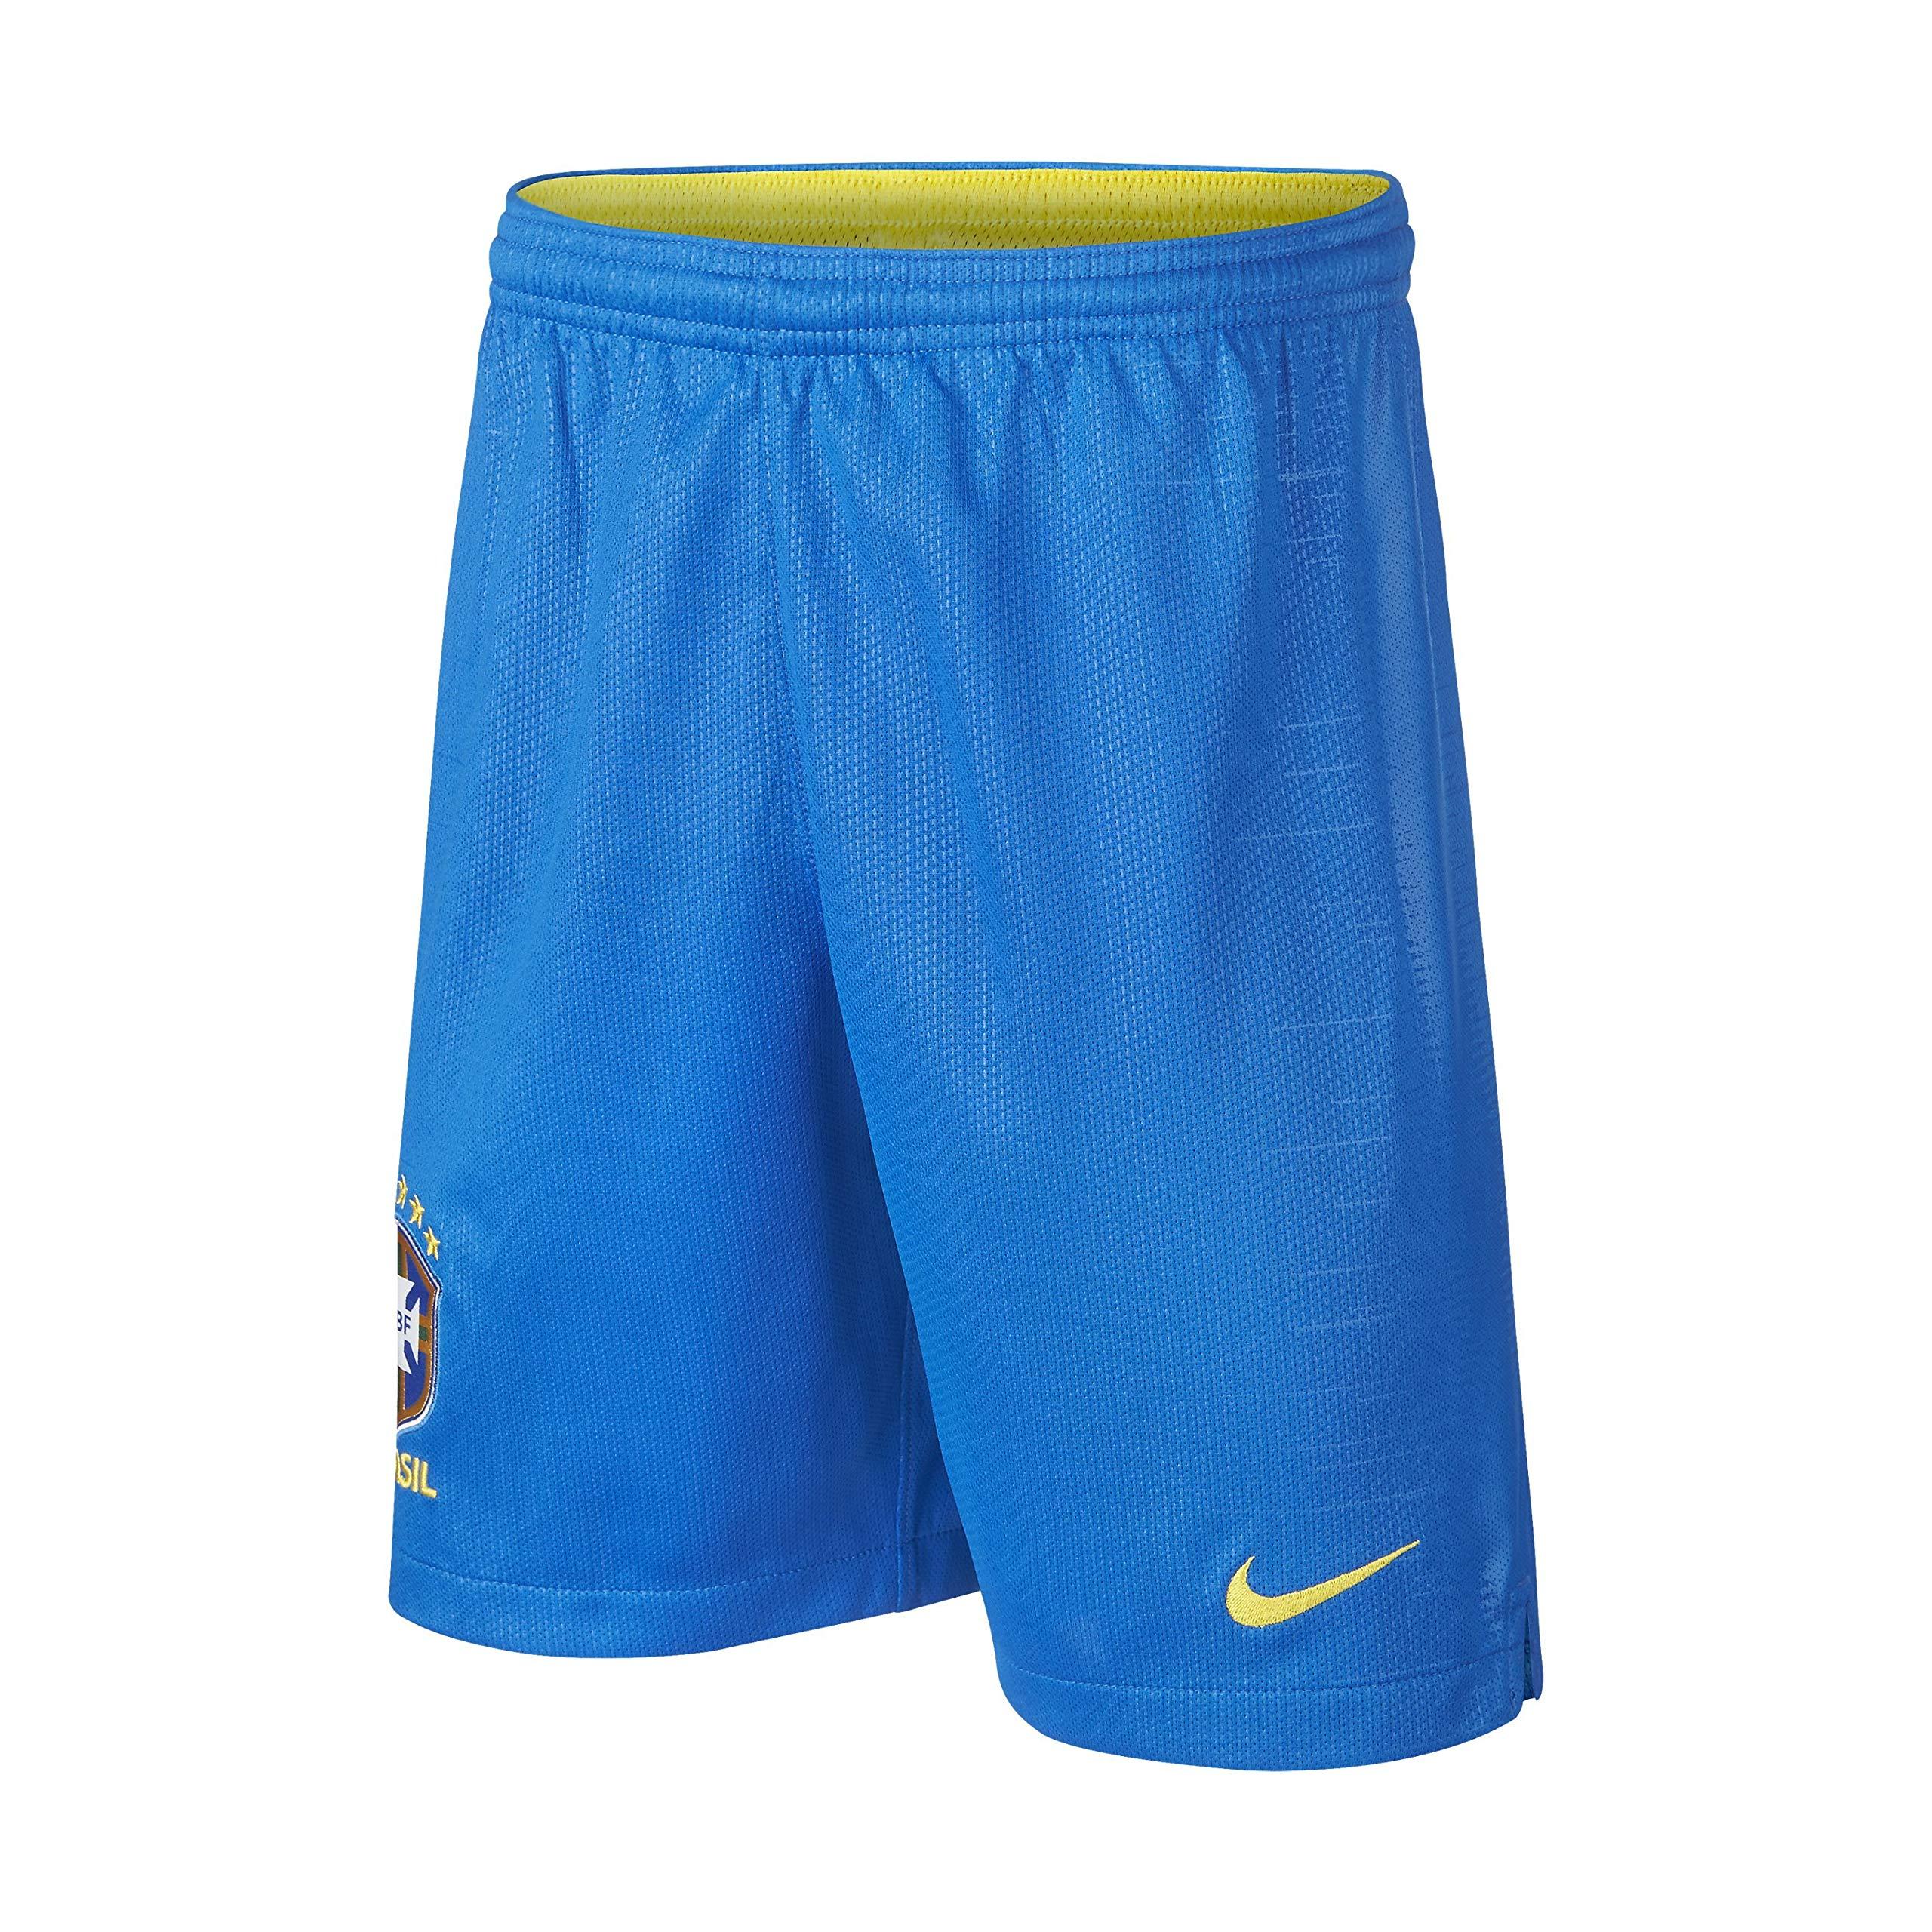 Nike Kids 2018-2019 Brazil Home Shorts, Blue, Large by Nike